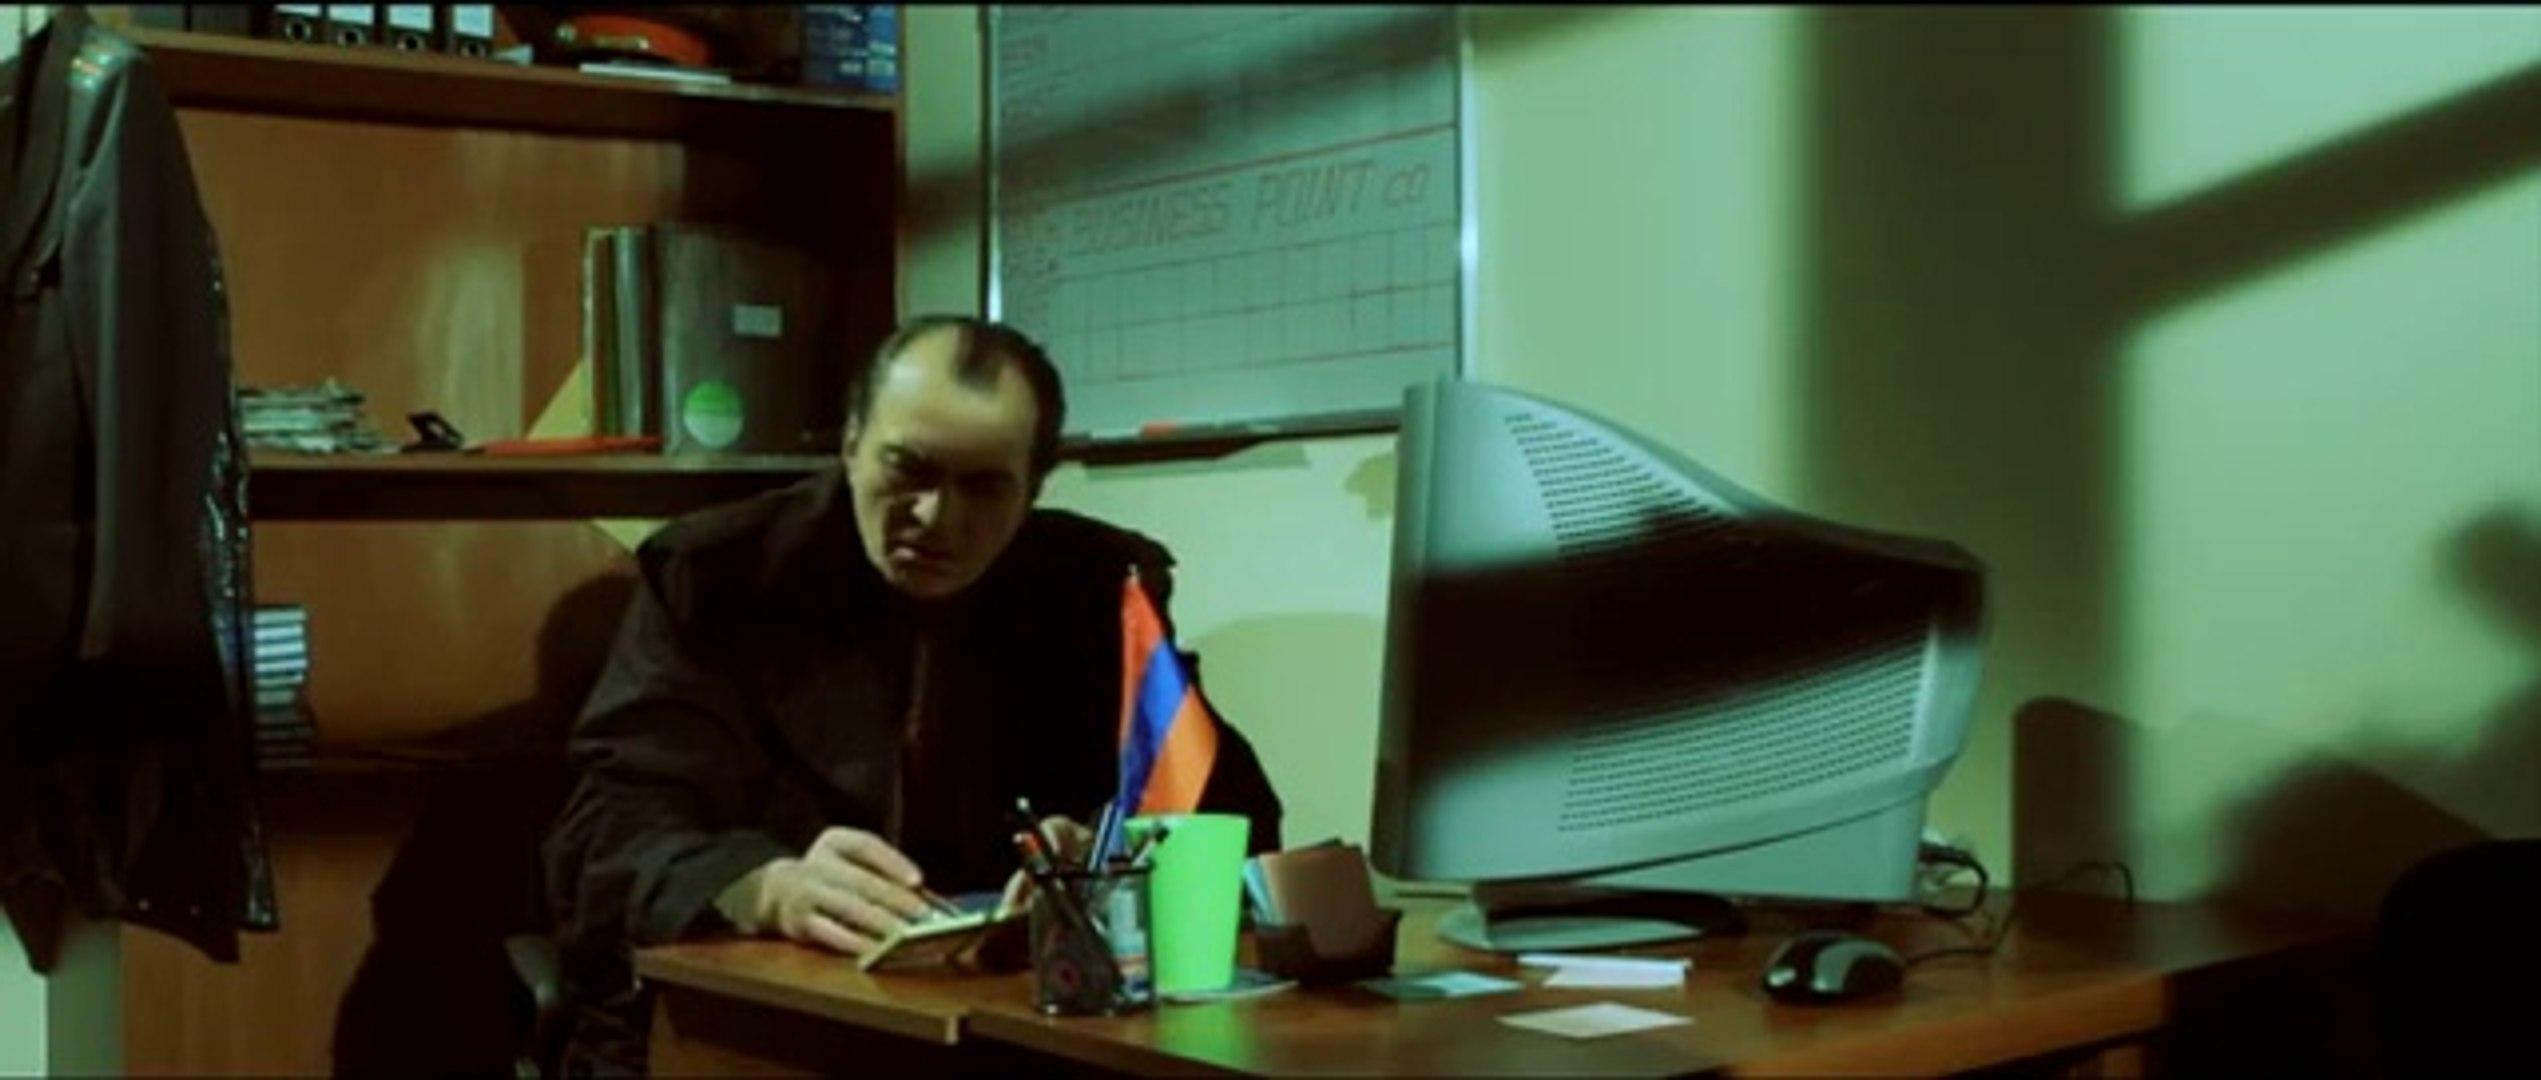 Смотреть онлайн армянский сериал Xaghic durs_11